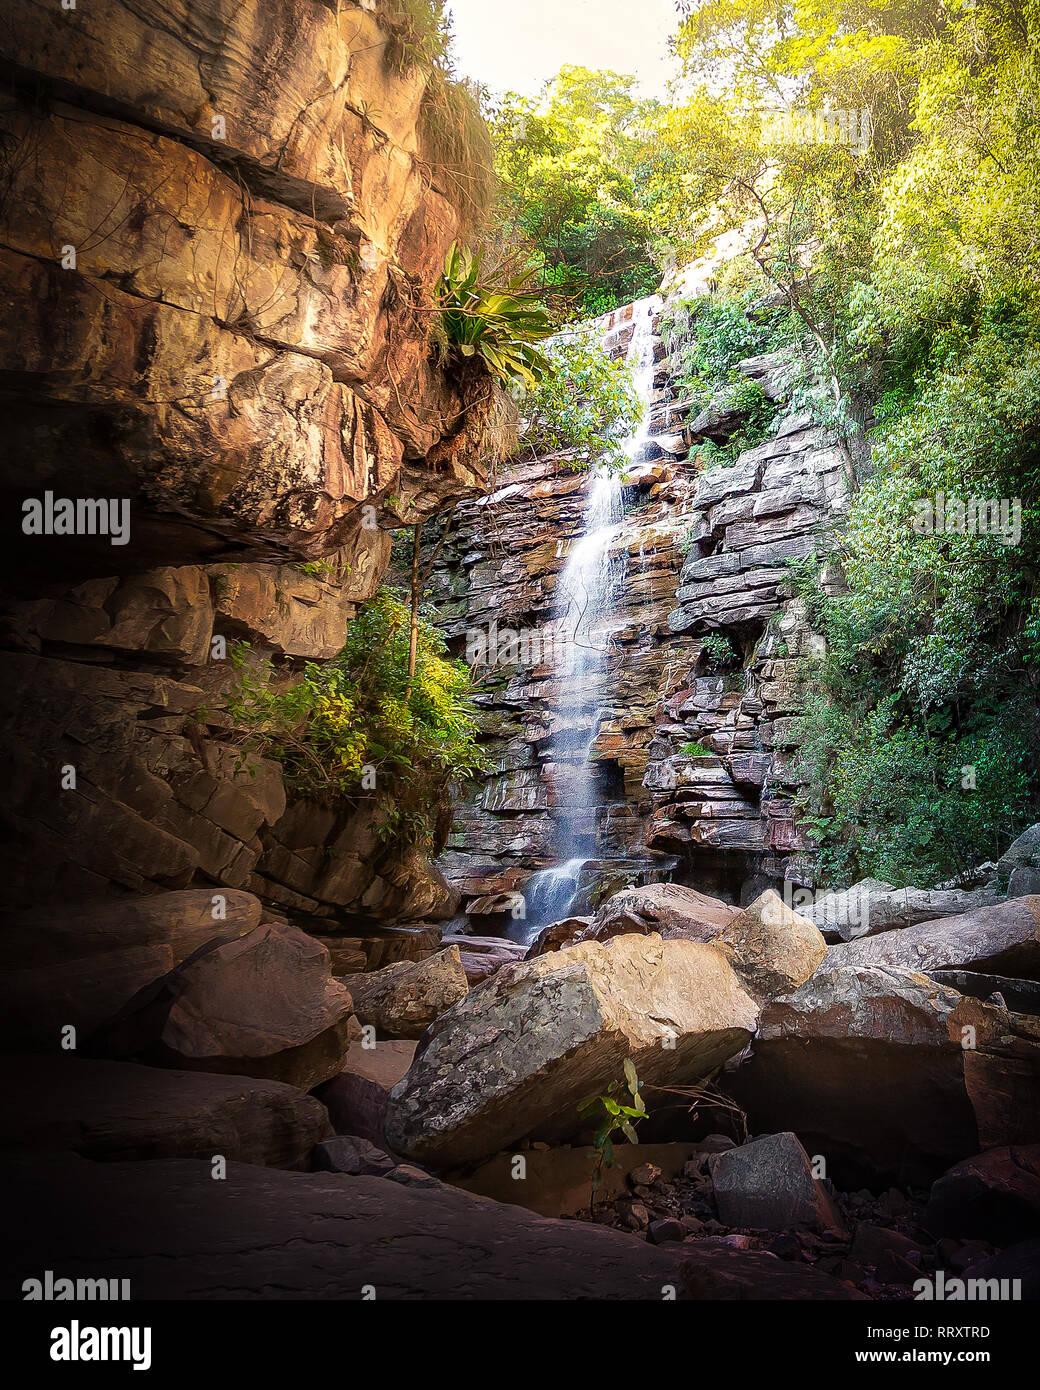 Mosquito Waterfall in Chapada Diamantina - Bahia, Brazil - Stock Image